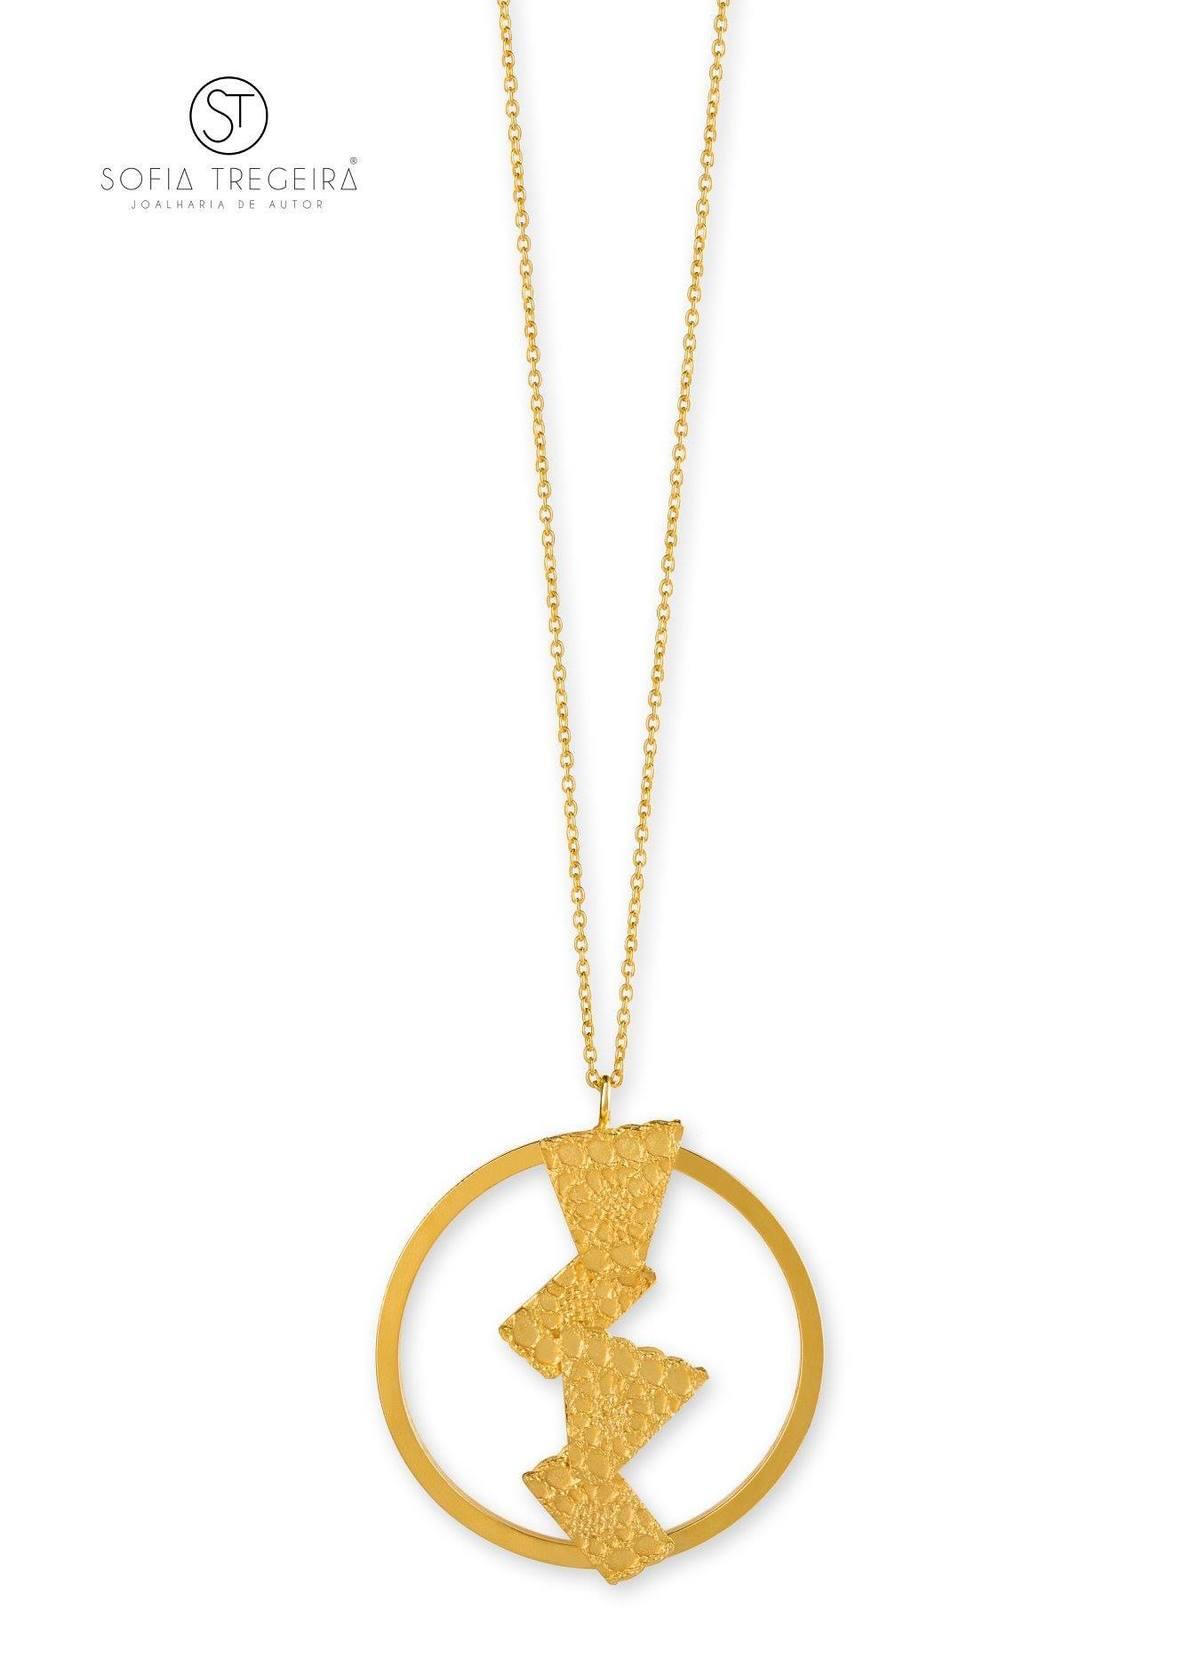 joalharia de autor; joalharia de luxo sofia tregeira; lace; collection; colar; necklace; prata; silver; ouro; gold; joalharia; jewellery; luxury;  jóias de casamento; wedding jewellery; noiva; bride; jóias de luxo; joalharia portuguesa